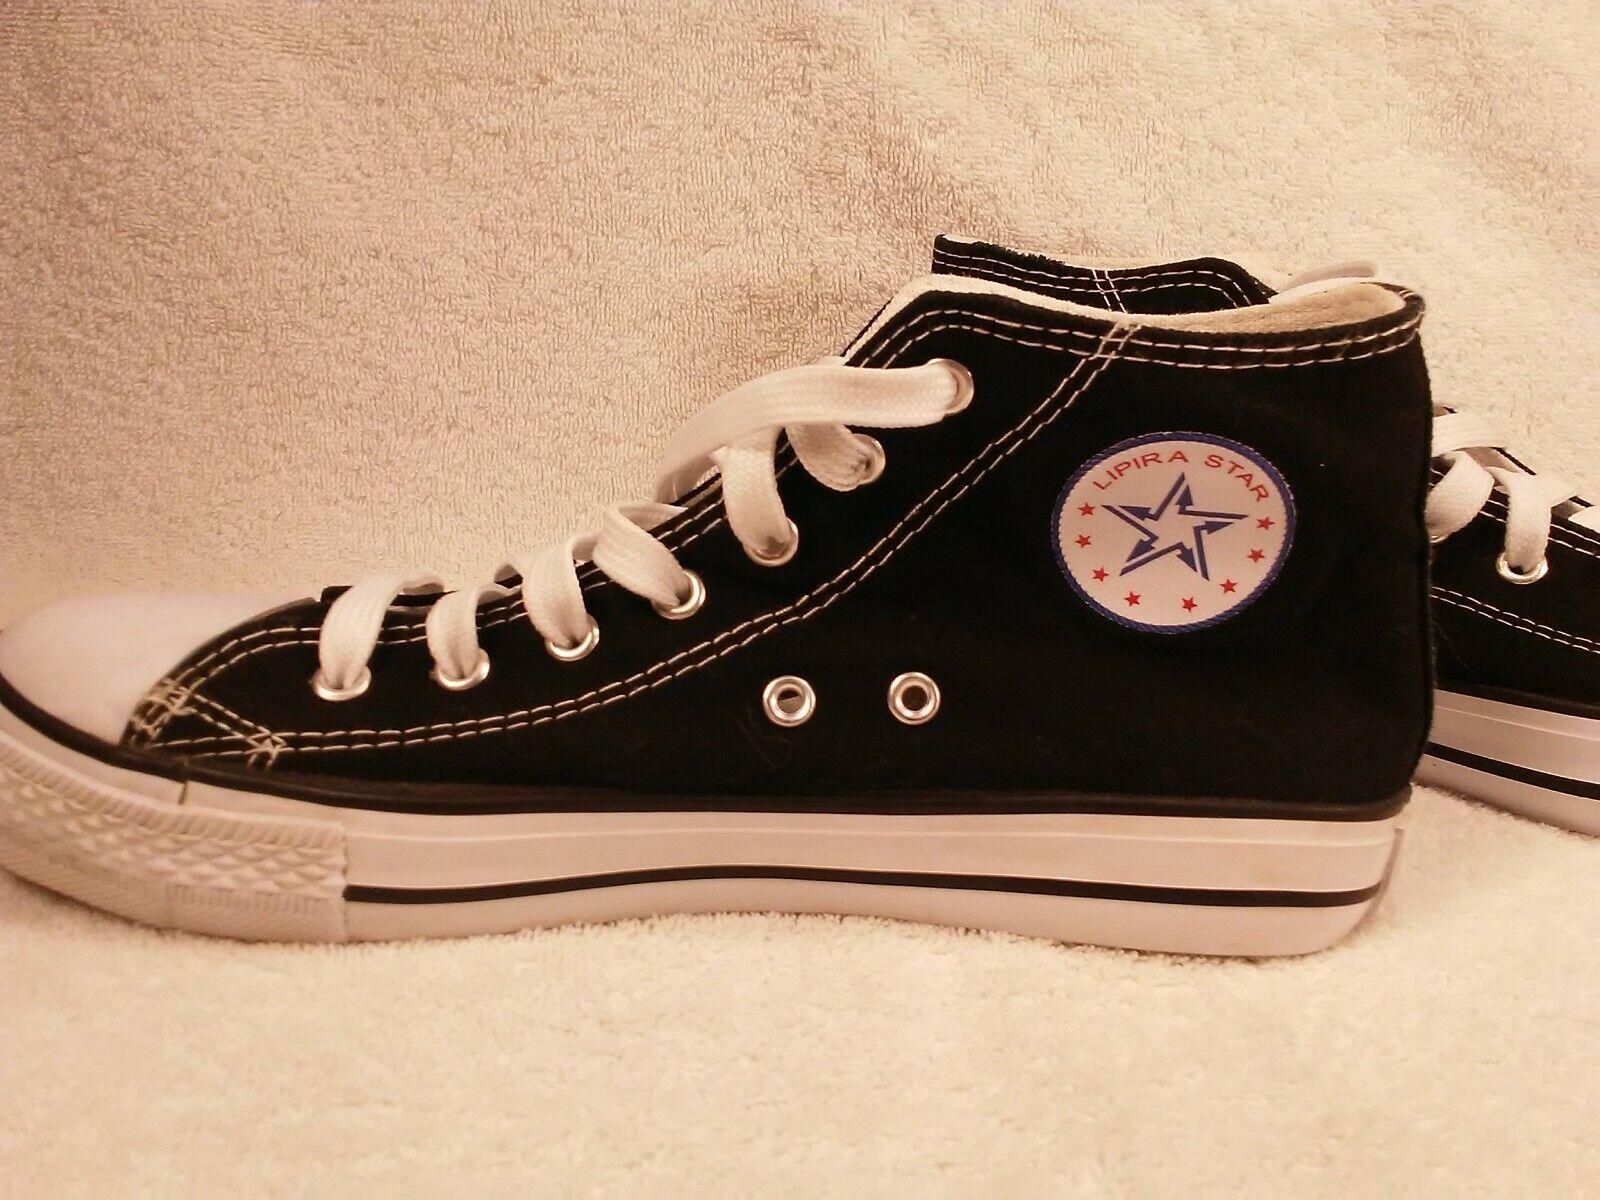 Lipira Star High Cut Unisex Canvas Shoes Fashion Prris Black size 10